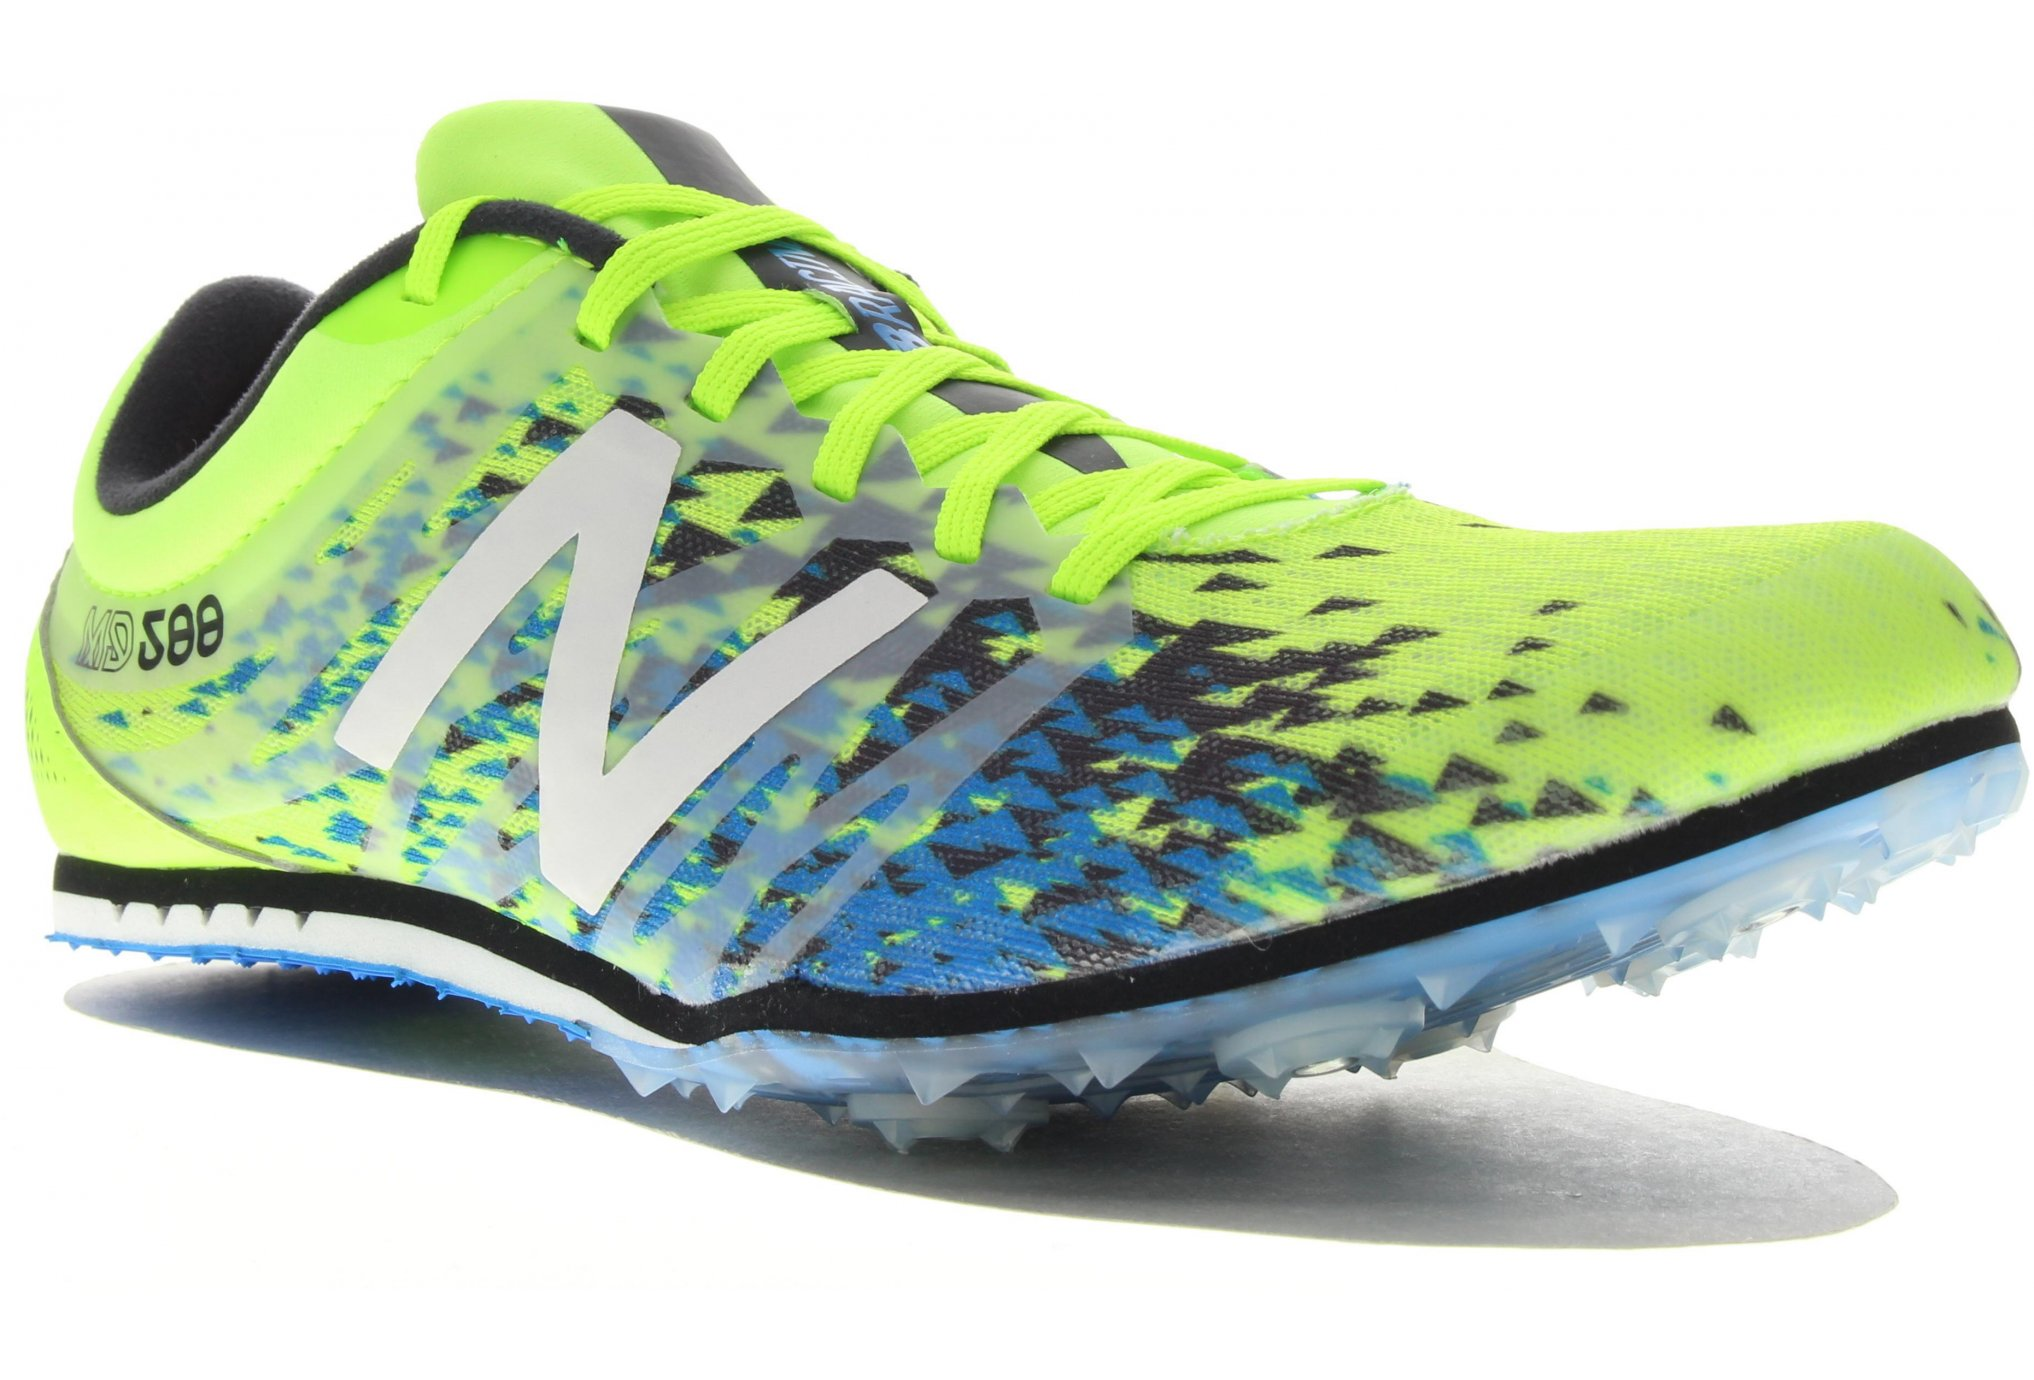 New Balance MD500V5 Spike M Diététique Chaussures homme